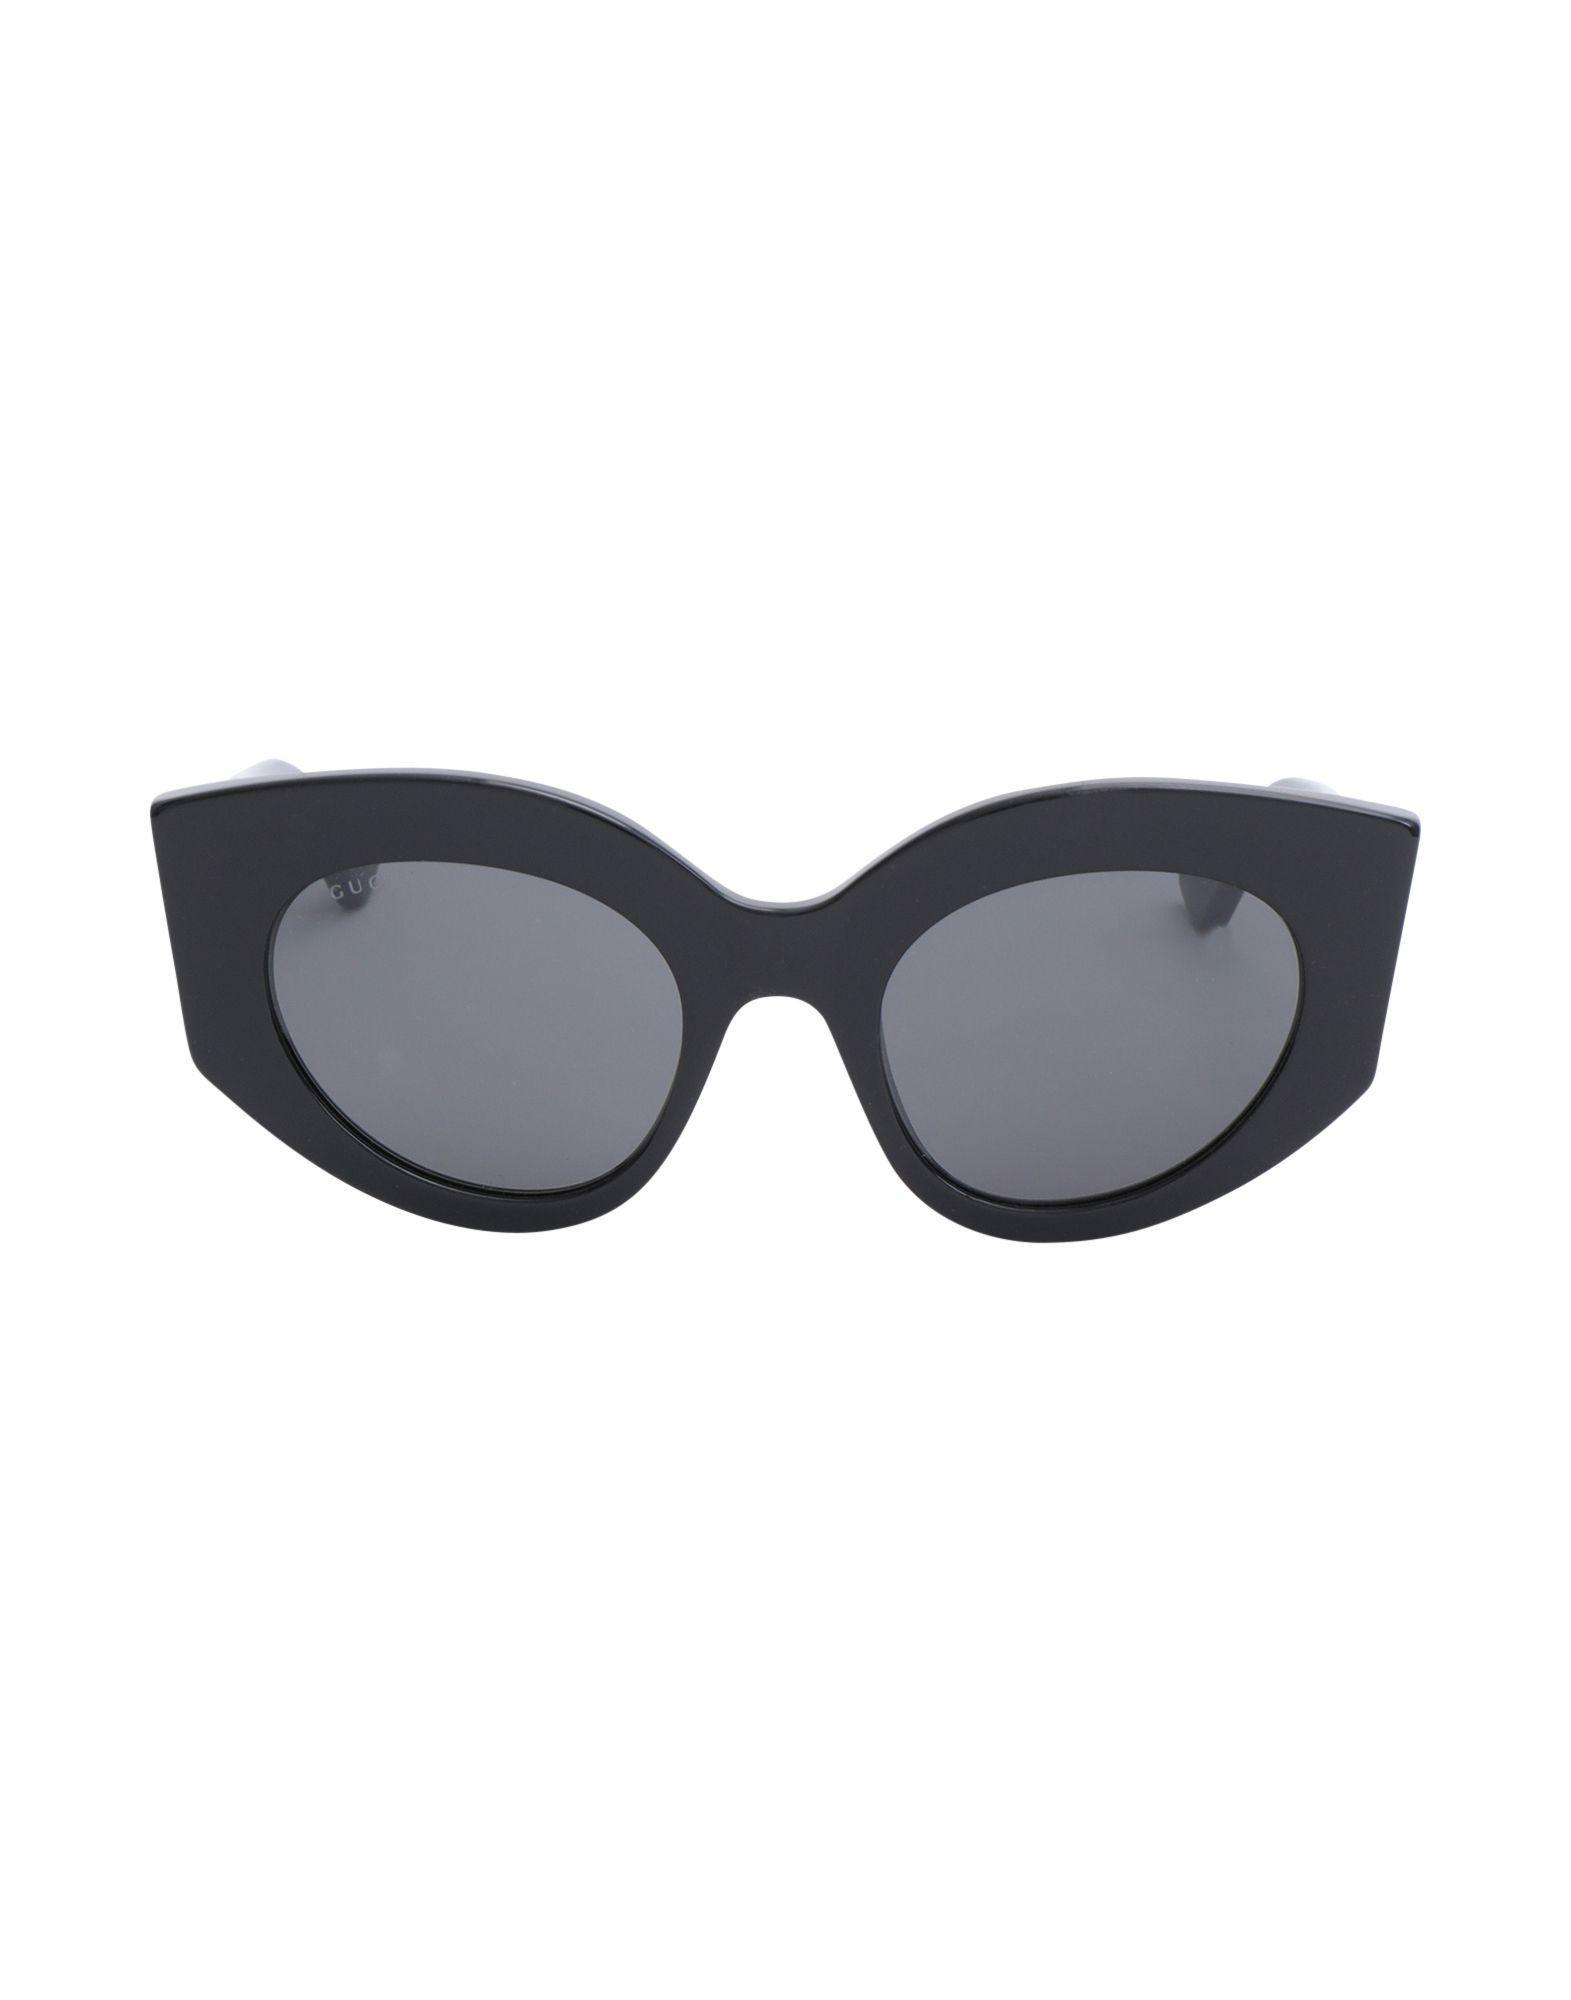 b64d95cfca8 Gucci Sunglasses in Black - Lyst